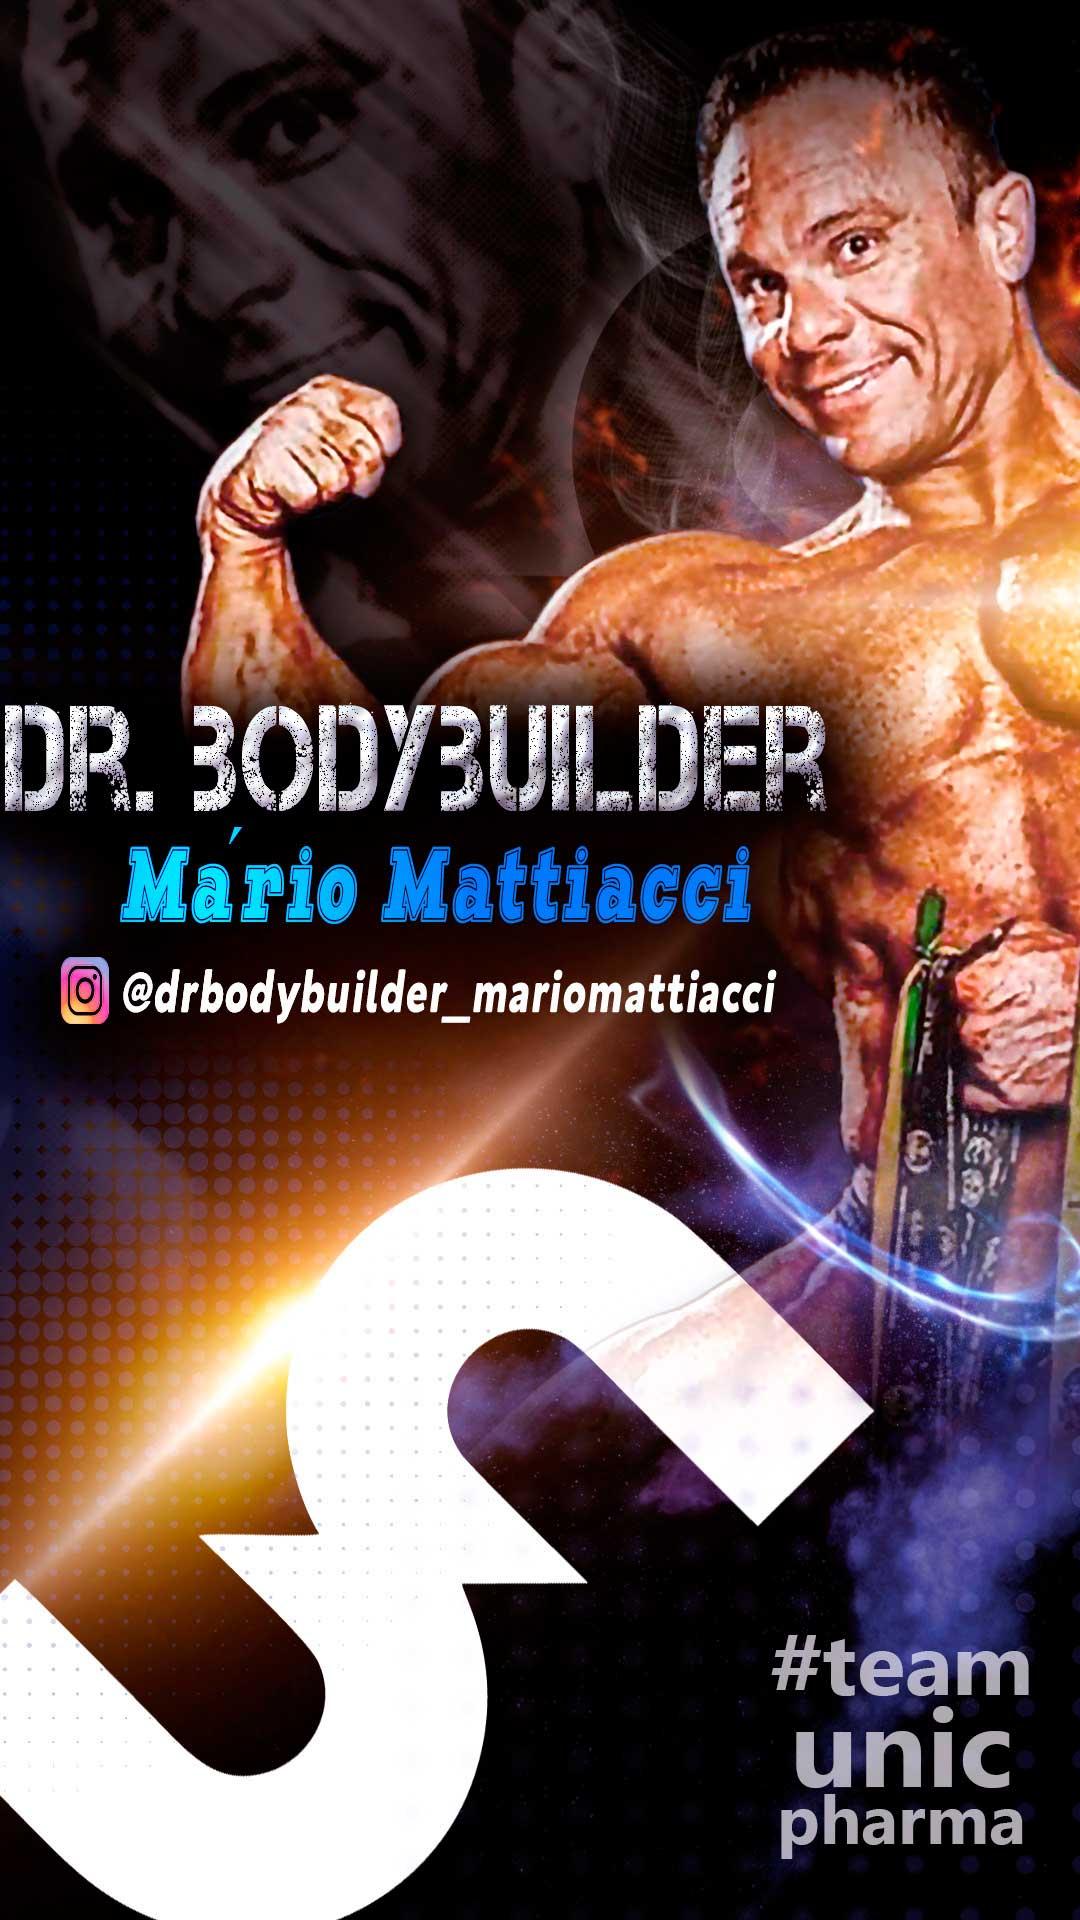 dr-bodybuilder